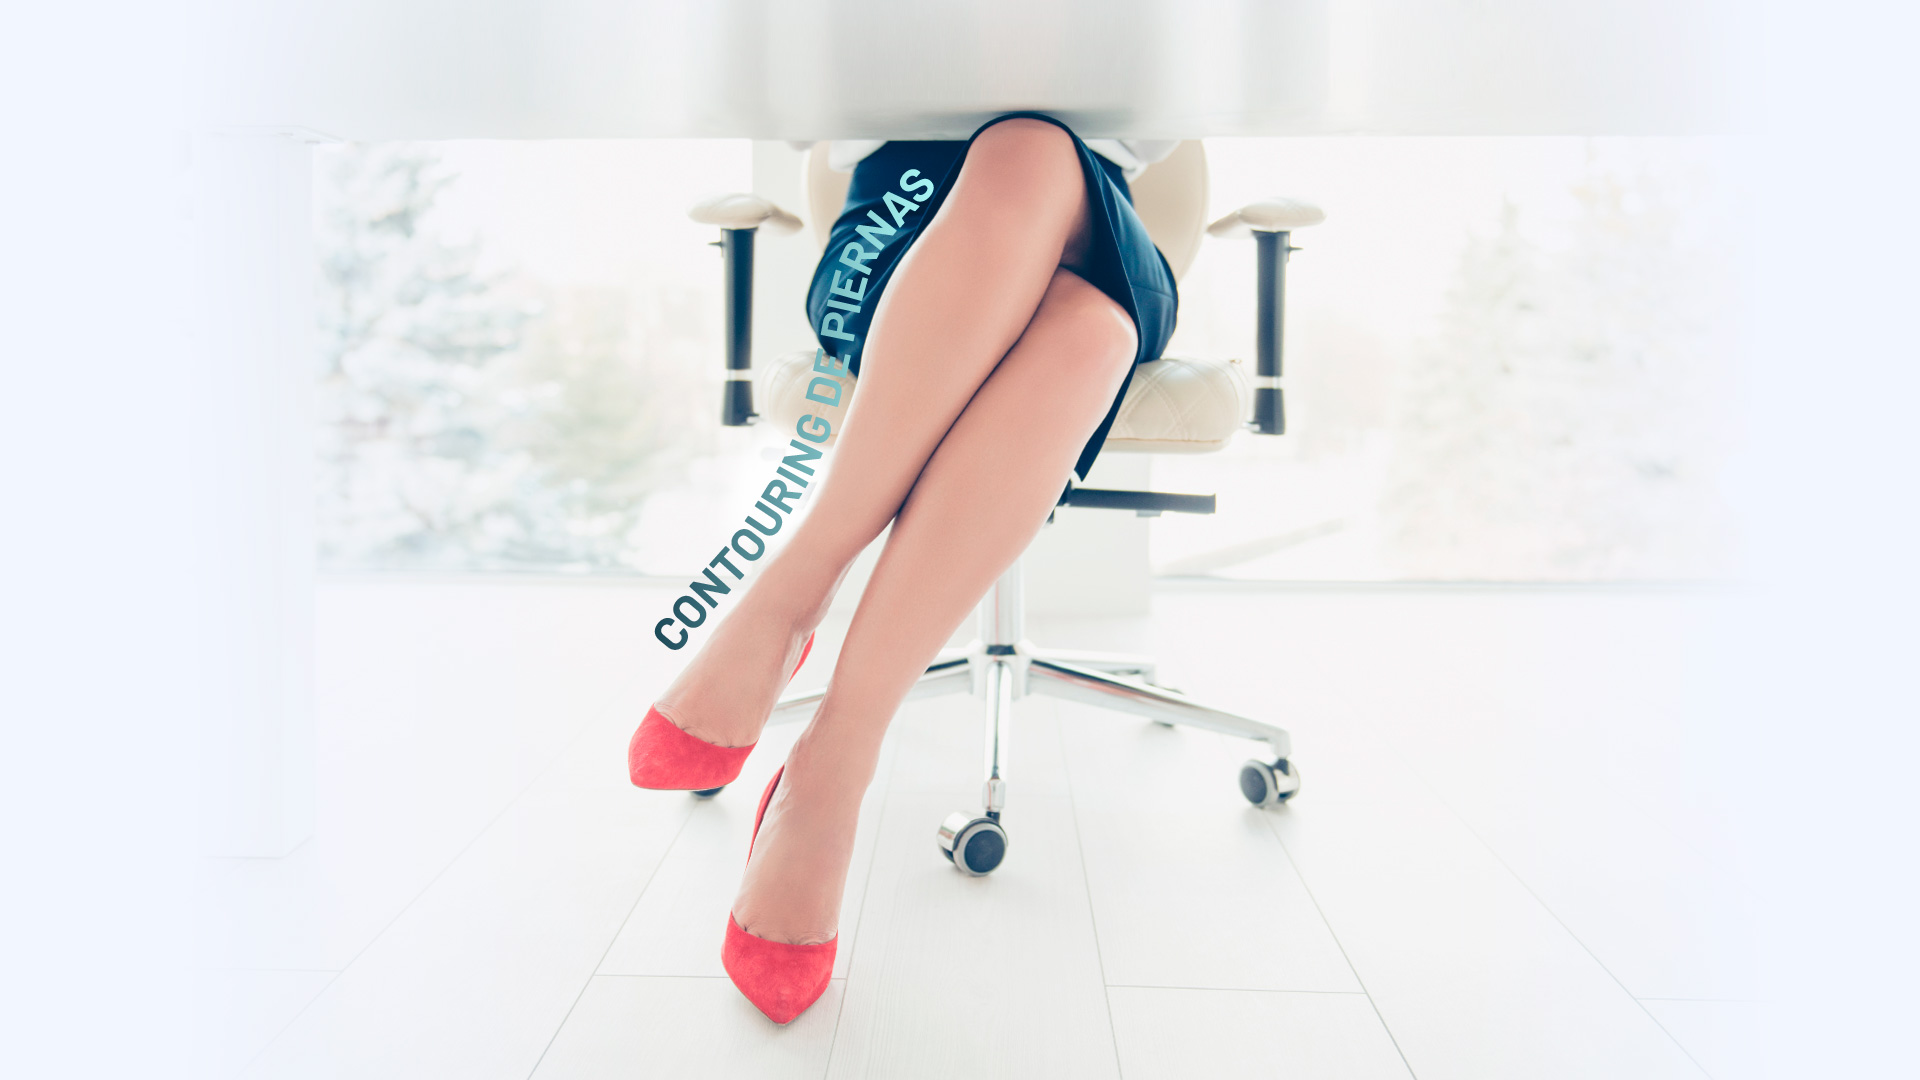 Contouring de piernas | Clínicas Diego de León